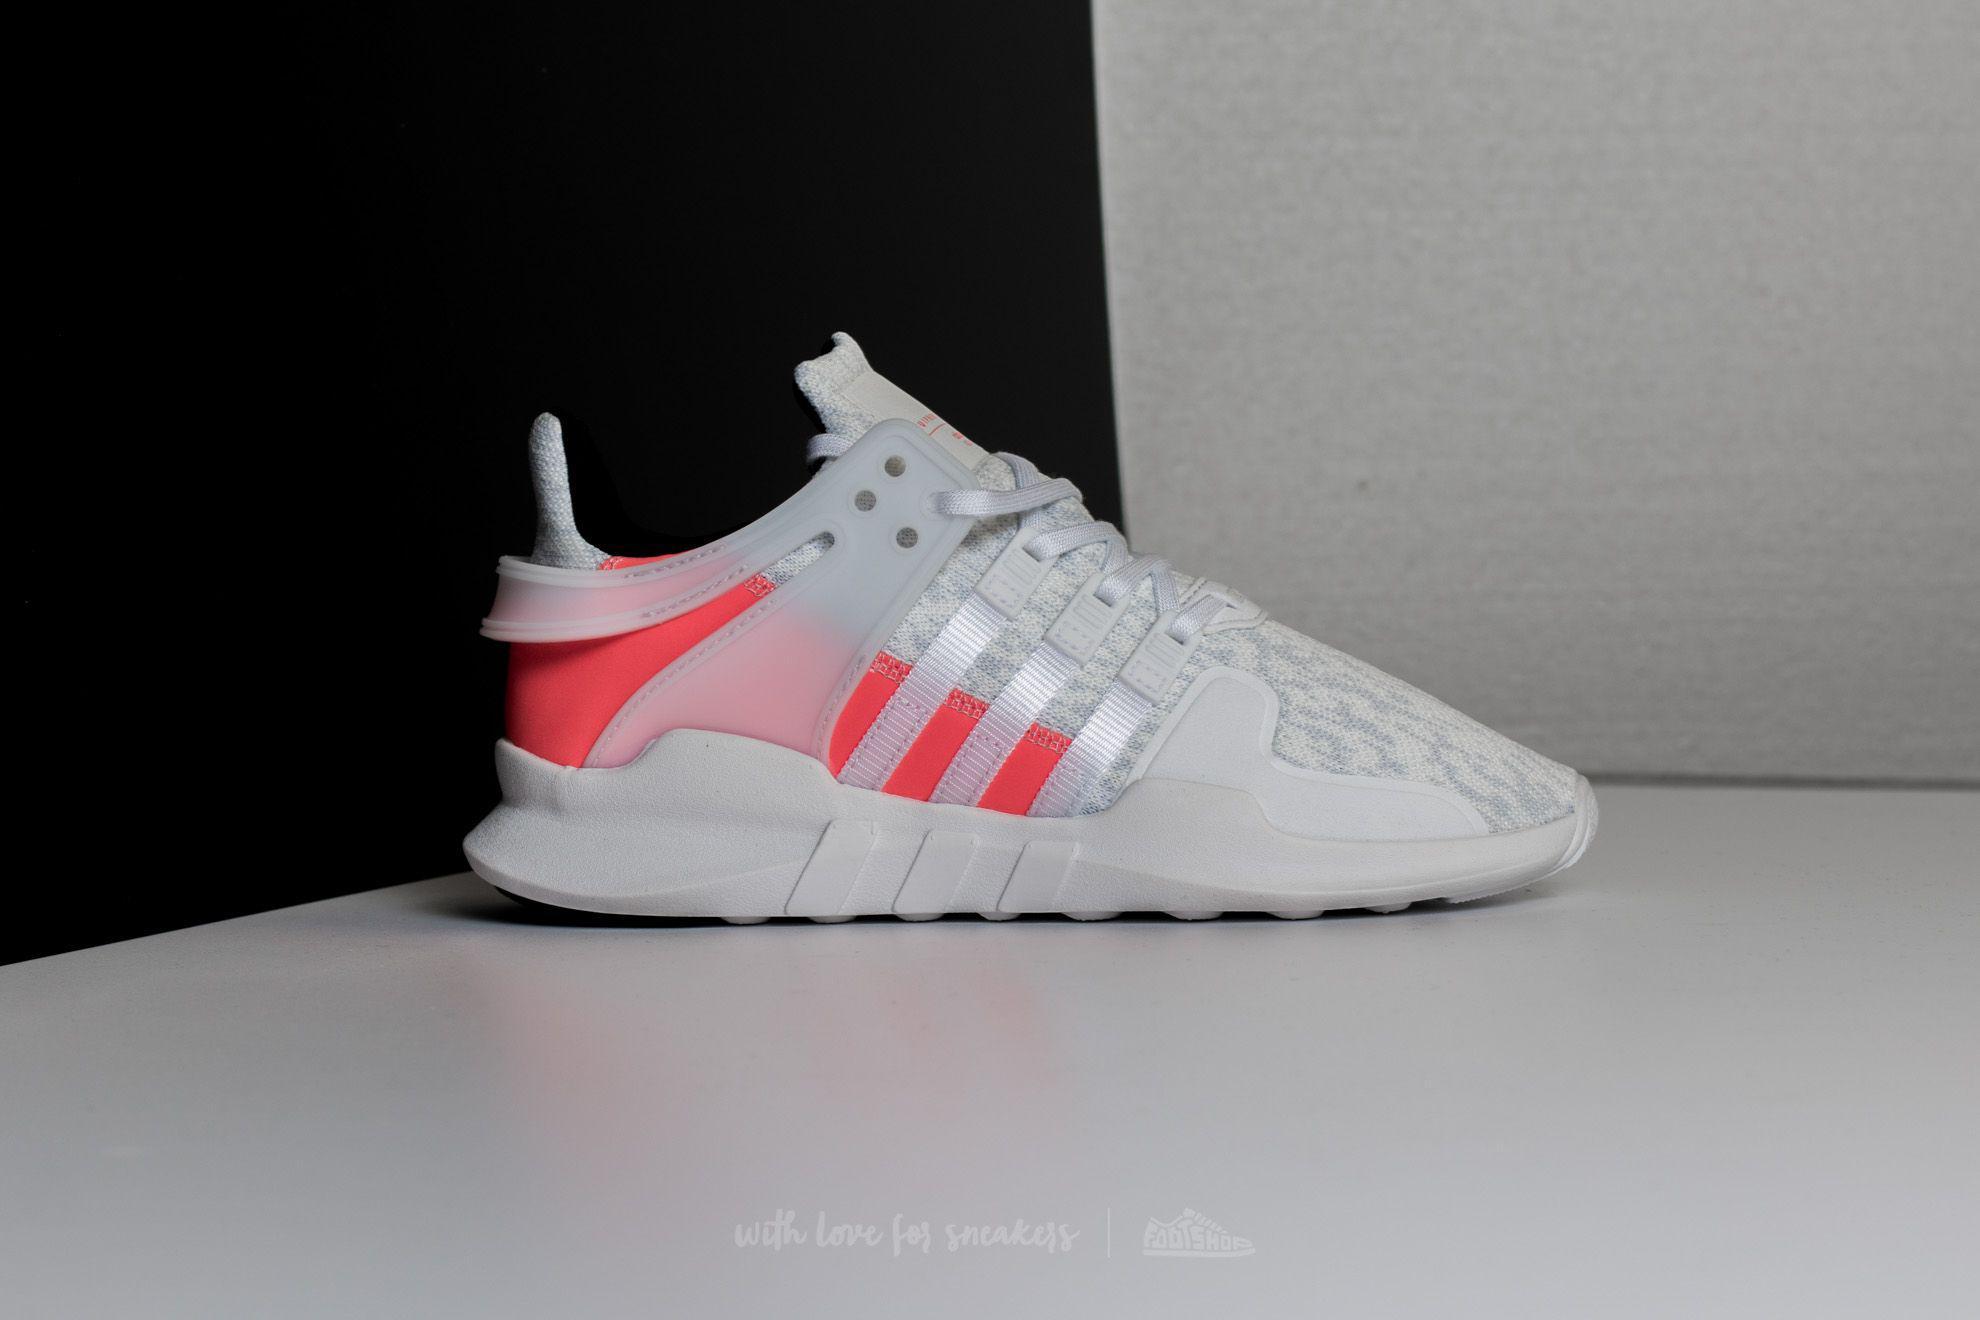 Lyst - adidas Originals Adidas Eqt Support Adv Crystal White ... b88b50386